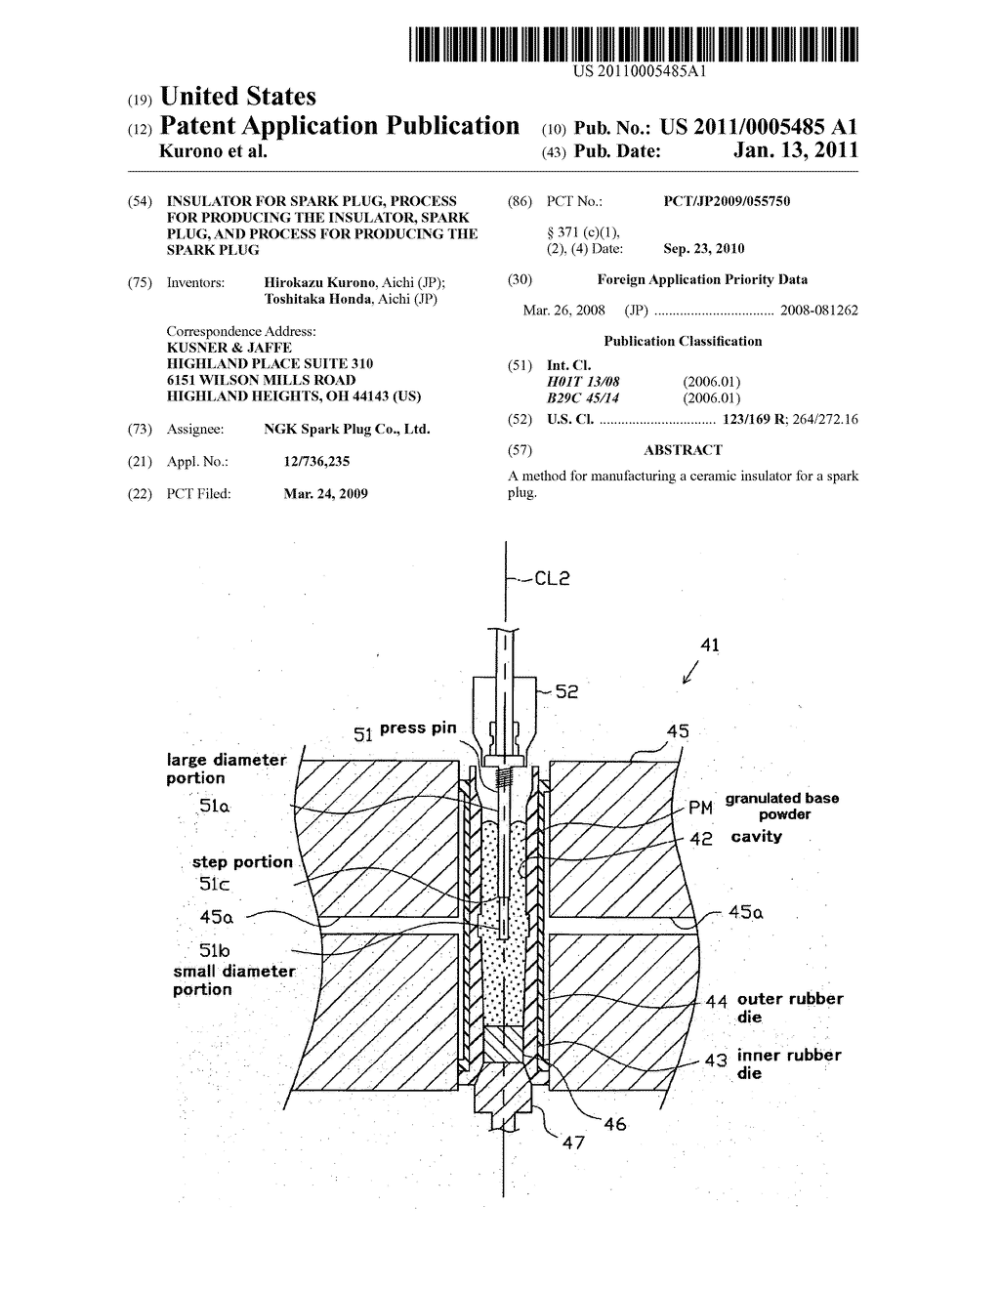 medium resolution of insulator for spark plug process for producing the insulator spark plug and process for producing the spark plug diagram schematic and image 01